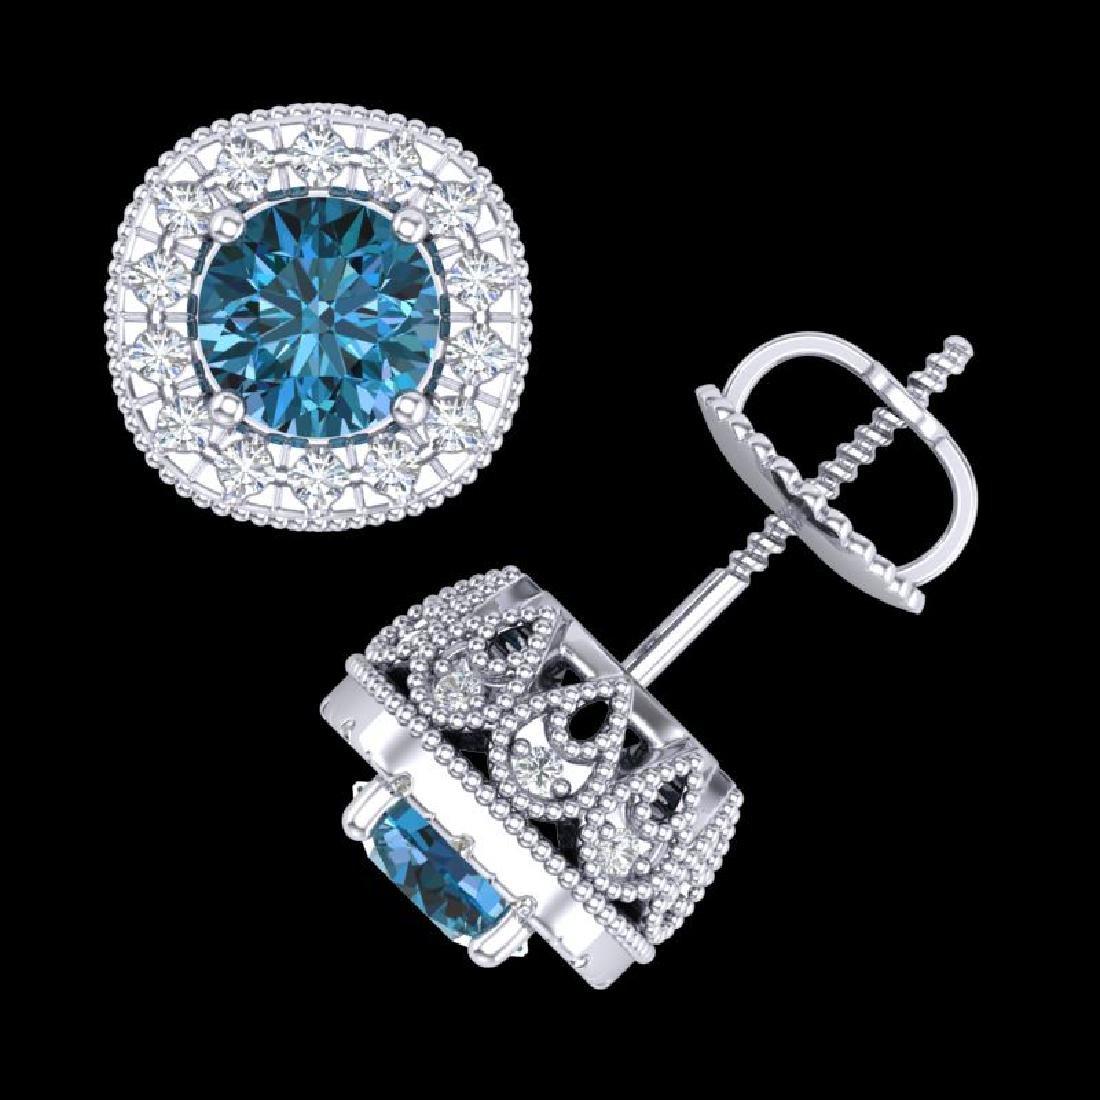 1.69 CTW Fancy Intense Blue Diamond Art Deco Stud - 3